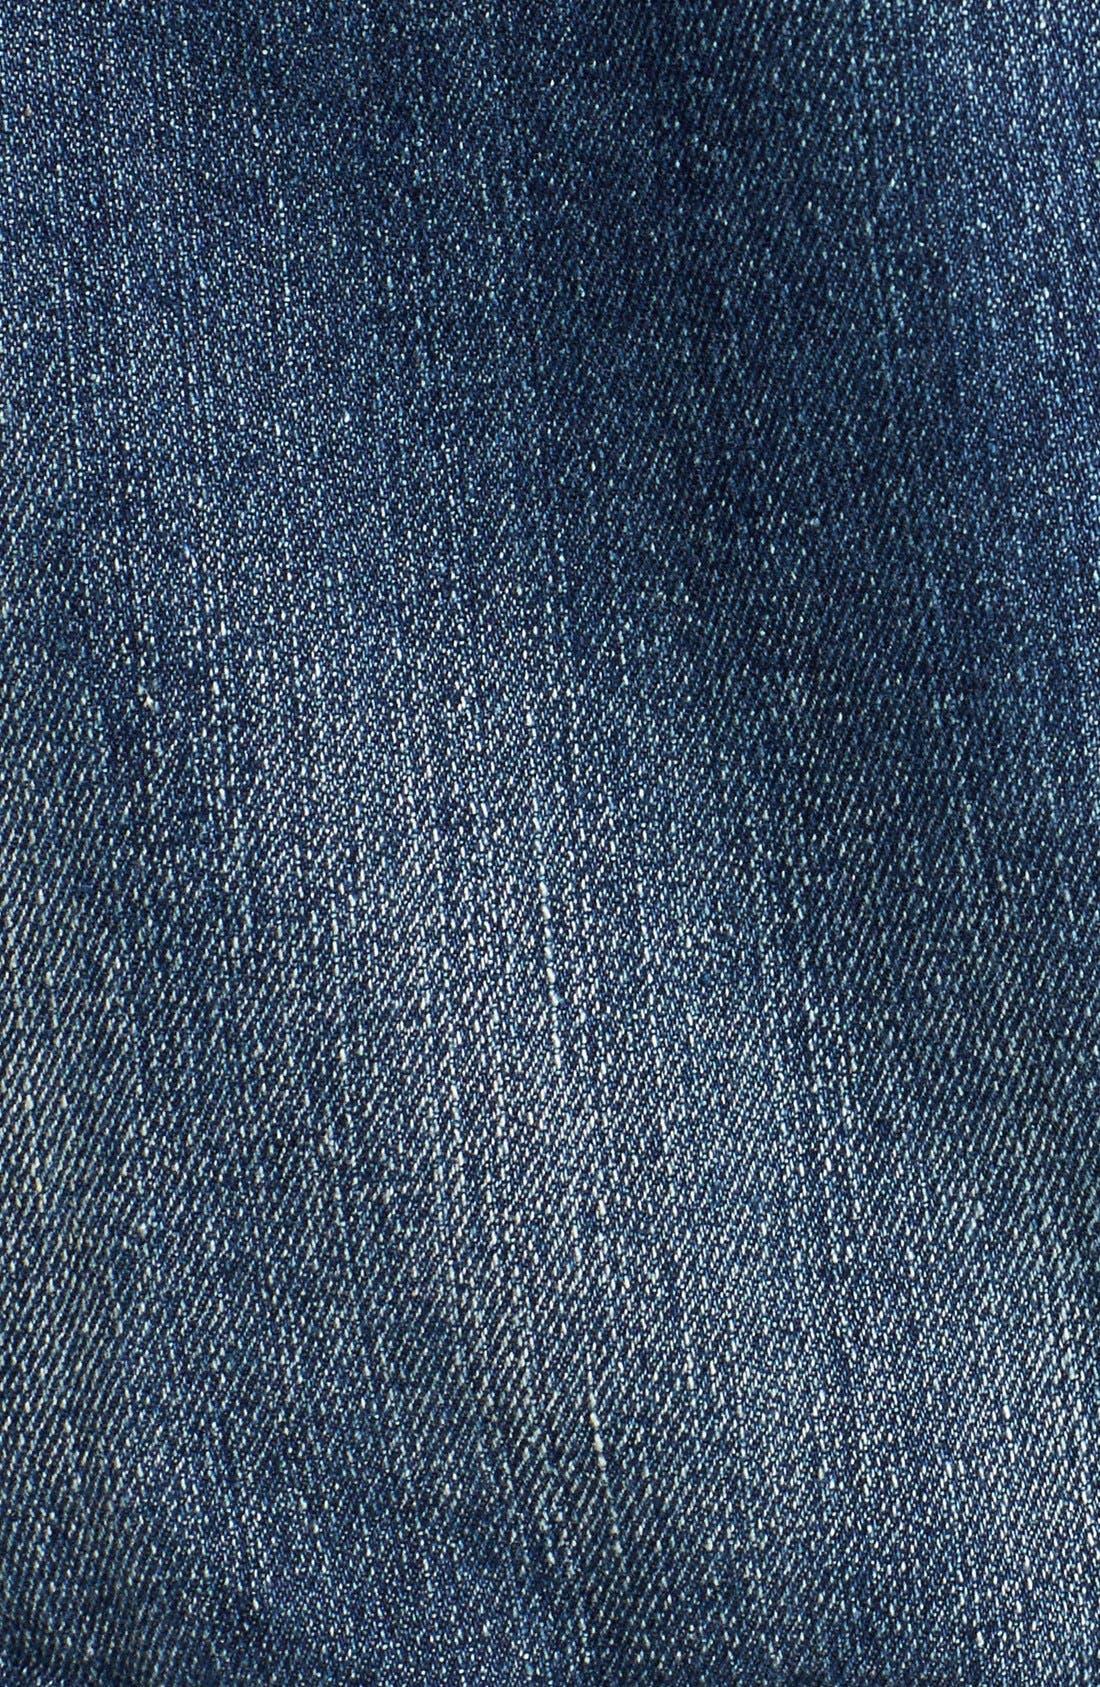 Alternate Image 3  - Thread & Supply Hooded Denim Jacket (Juniors)